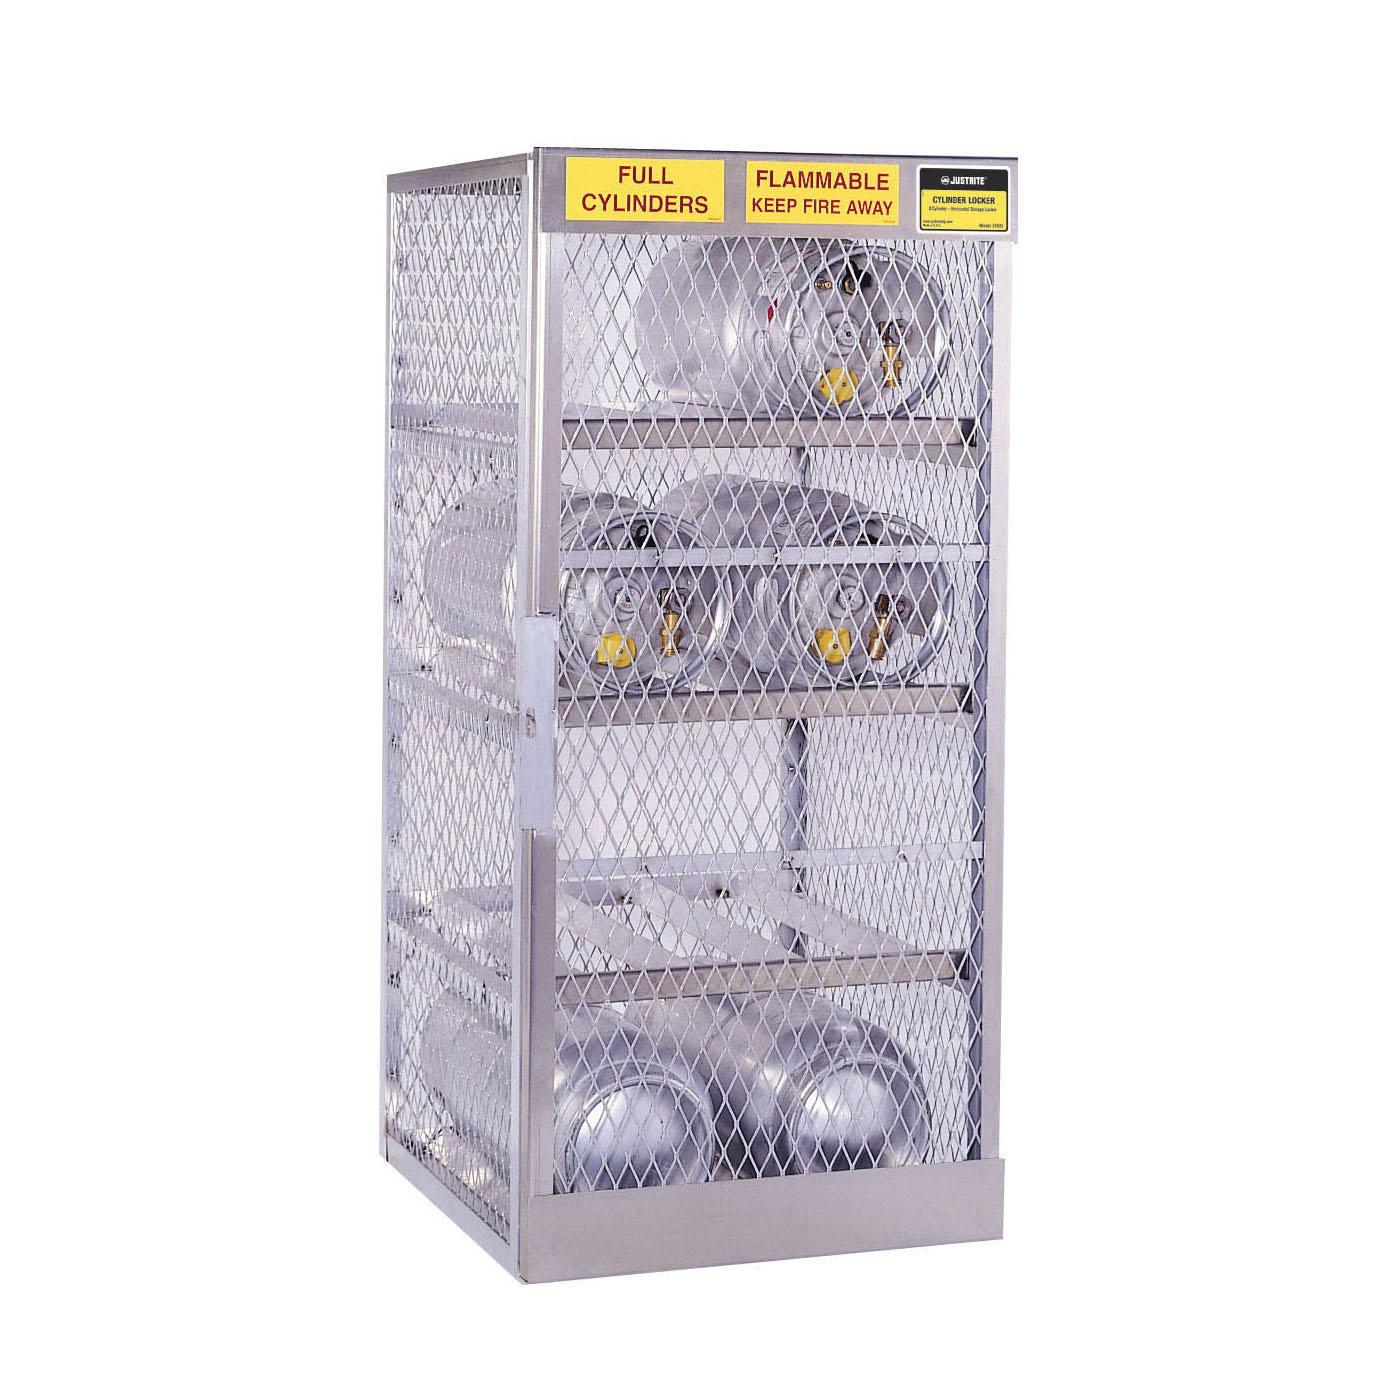 Justrite® 23003 Horizontal LPG Cylinder Locker, (8) 20 lb/33 lb, 65 in H x 30 in W x 32 in D, Aluminum Roof, Welded Aluminum, Aluminum